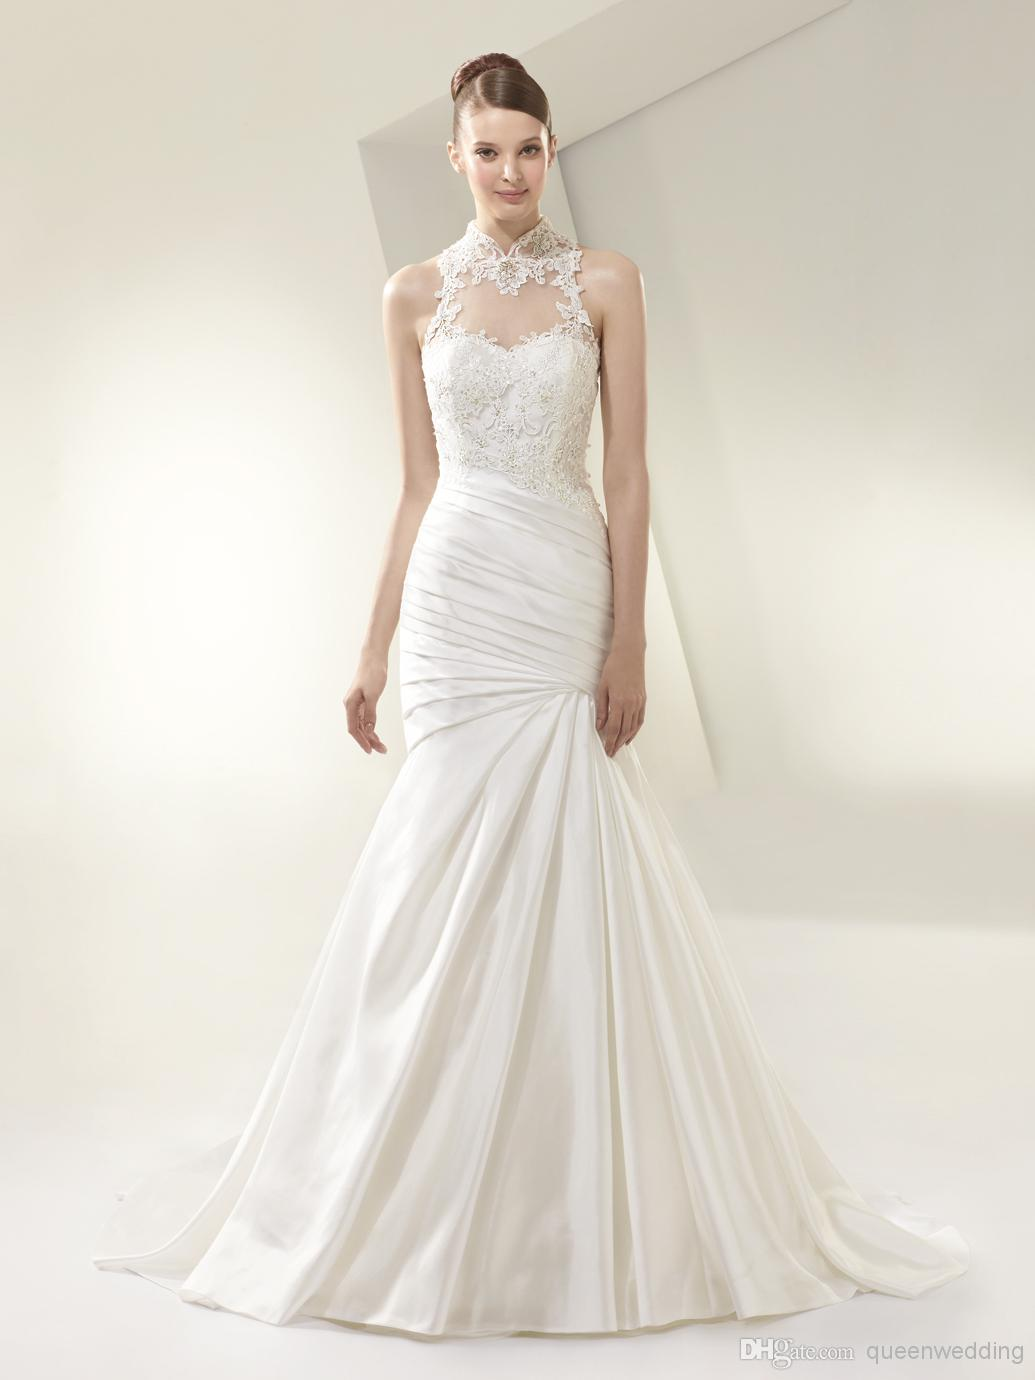 New Fashion Elegant Mermaid Bridal Gown High Neck Sheer